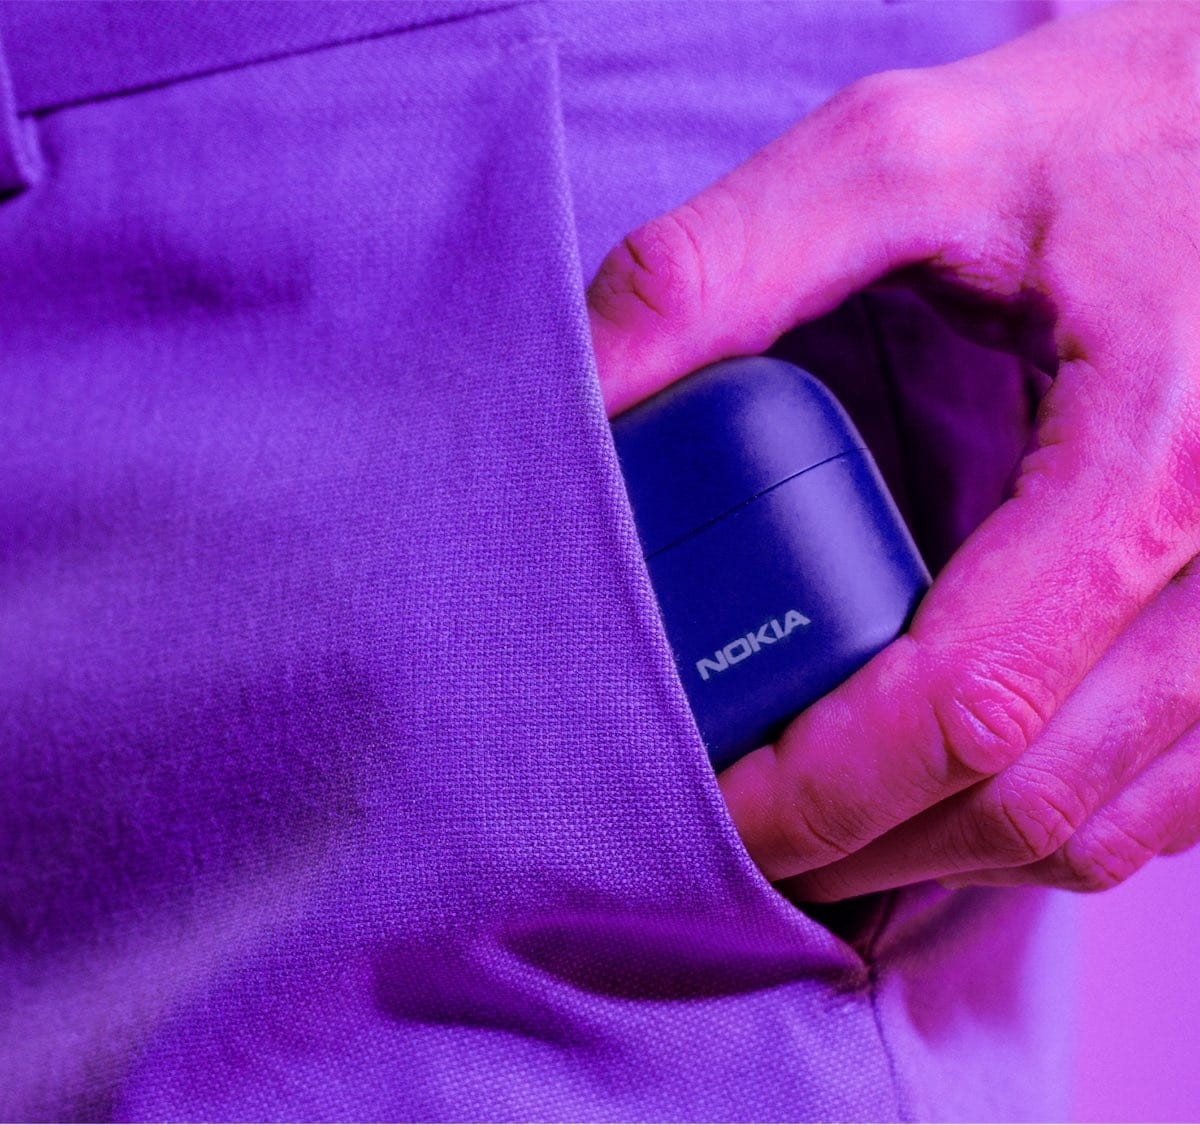 Nokia Power Earbuds Lite are completely waterproof